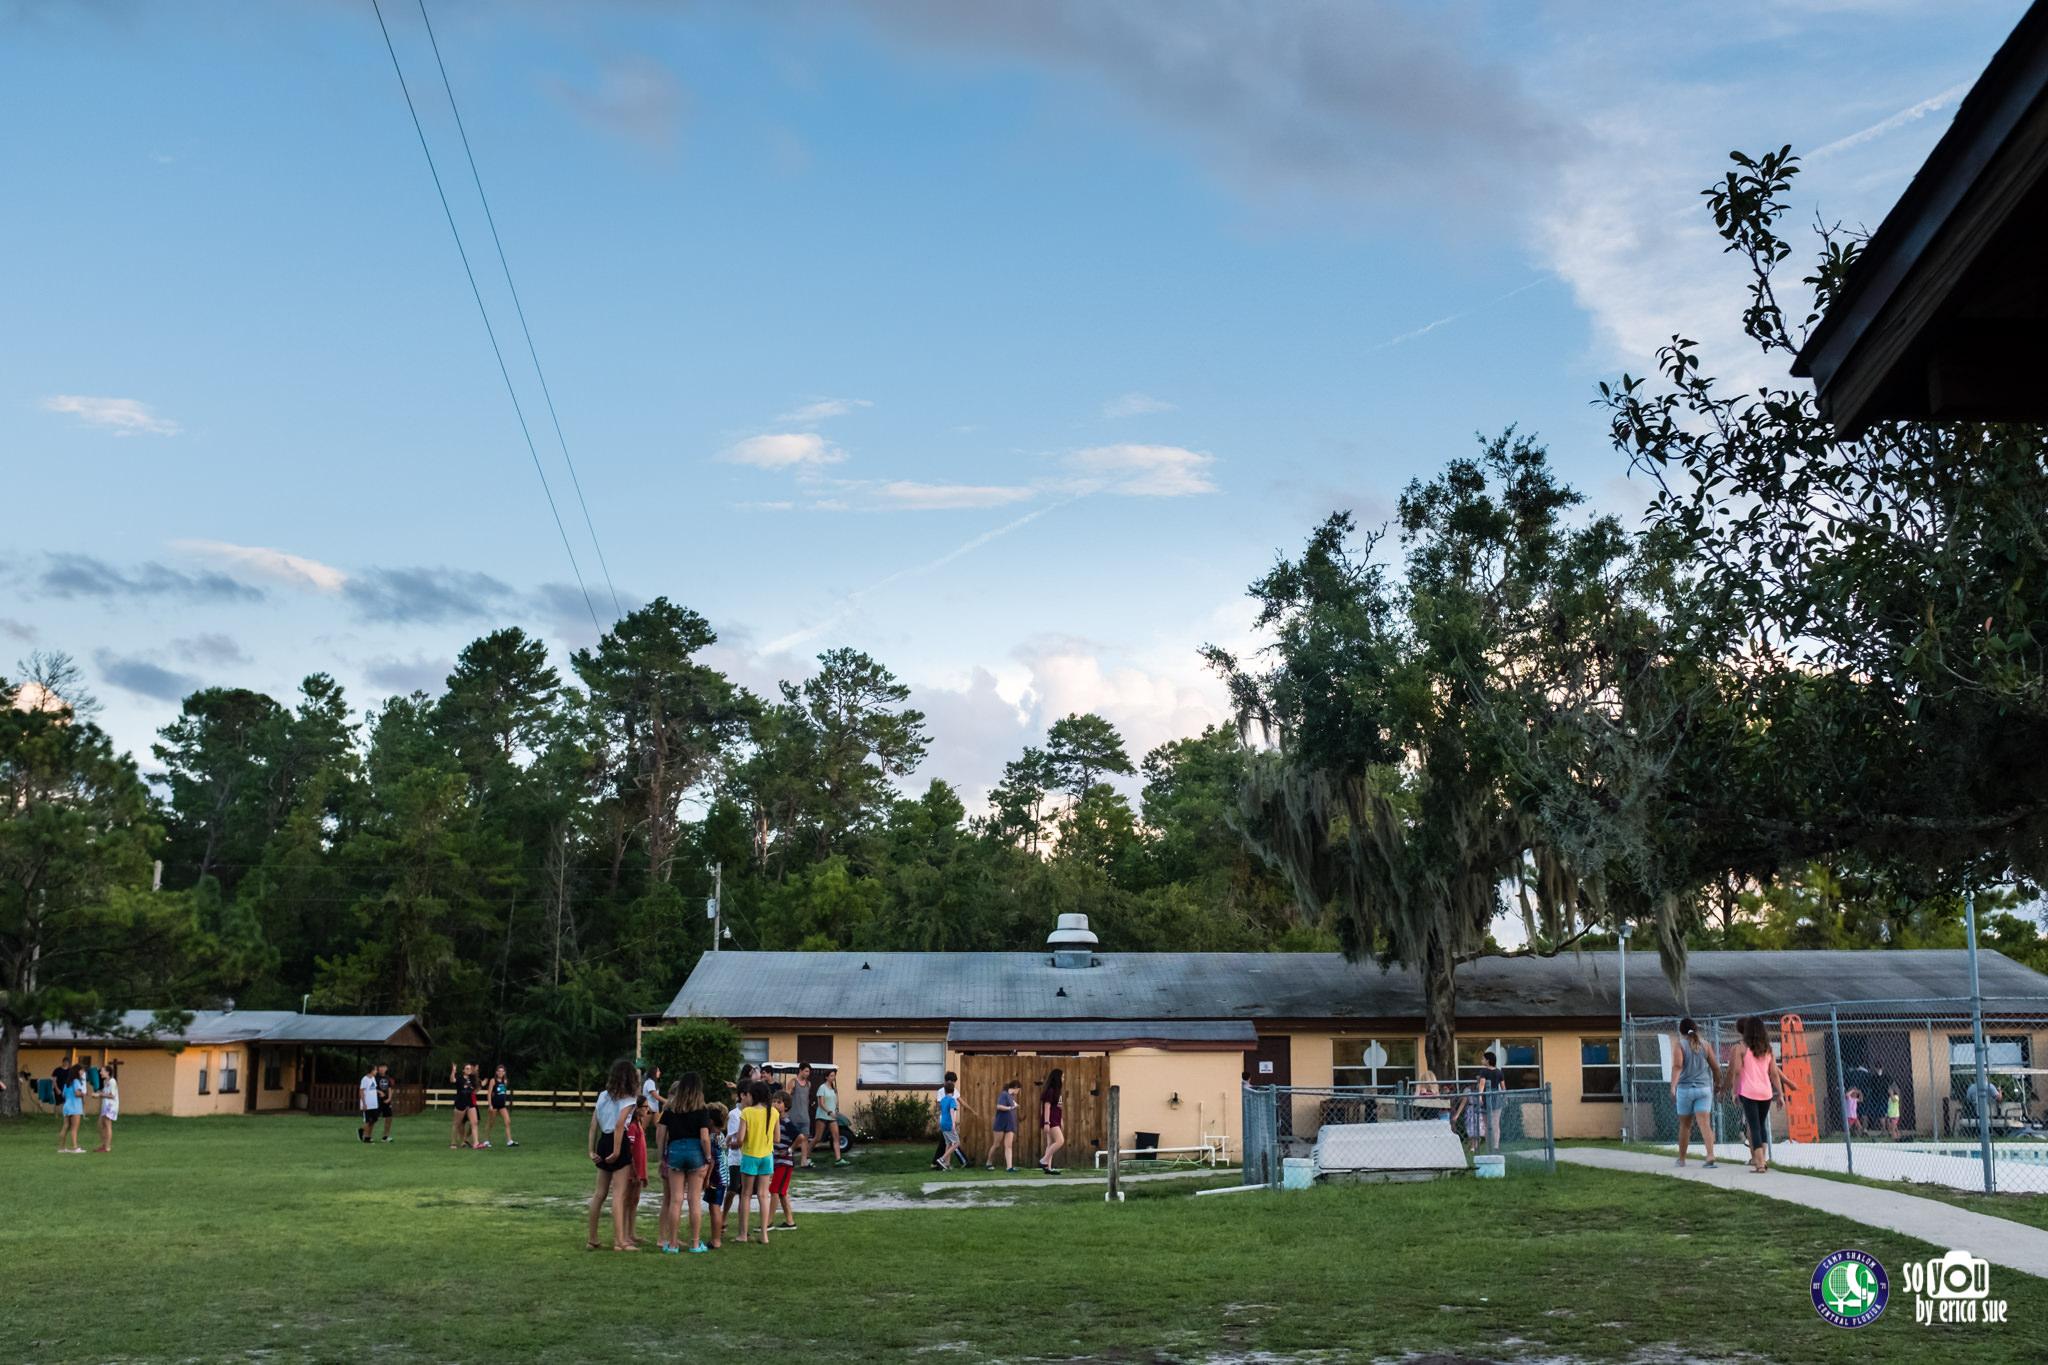 so-you-by-erica-sue-camp-shalom-central-florida-sleepaway-camp-2024.jpg